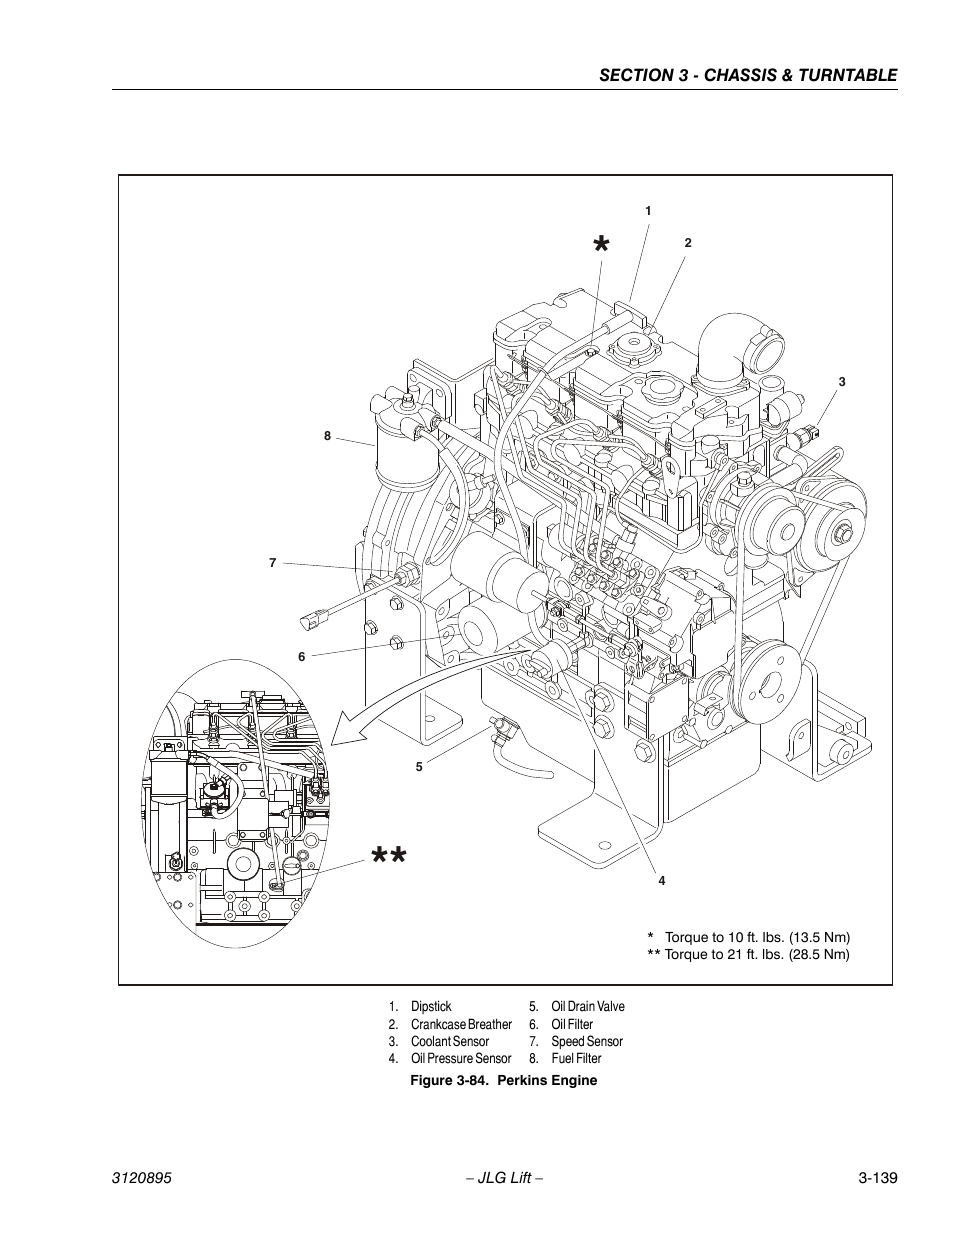 medium resolution of perkins engine 139 jlg 460sj service manual user manual page 191 462